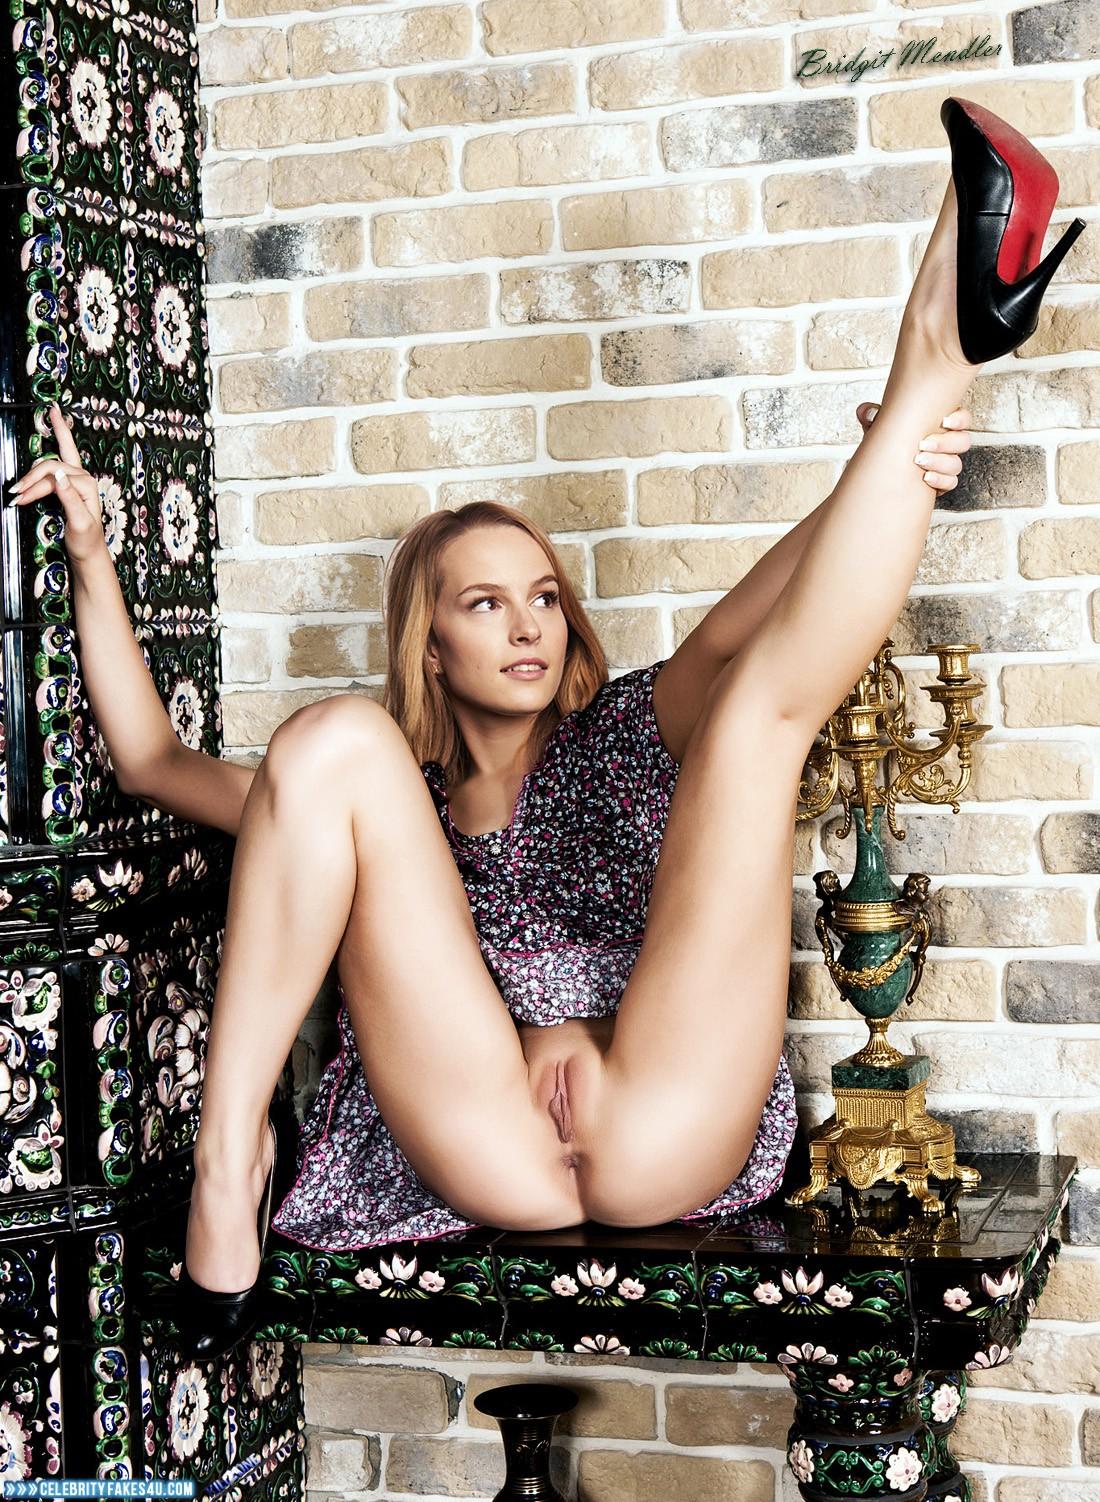 Bridgit Mendler Naked bridgit mendler ass pussy nudes 001 � celebrity fakes 4u